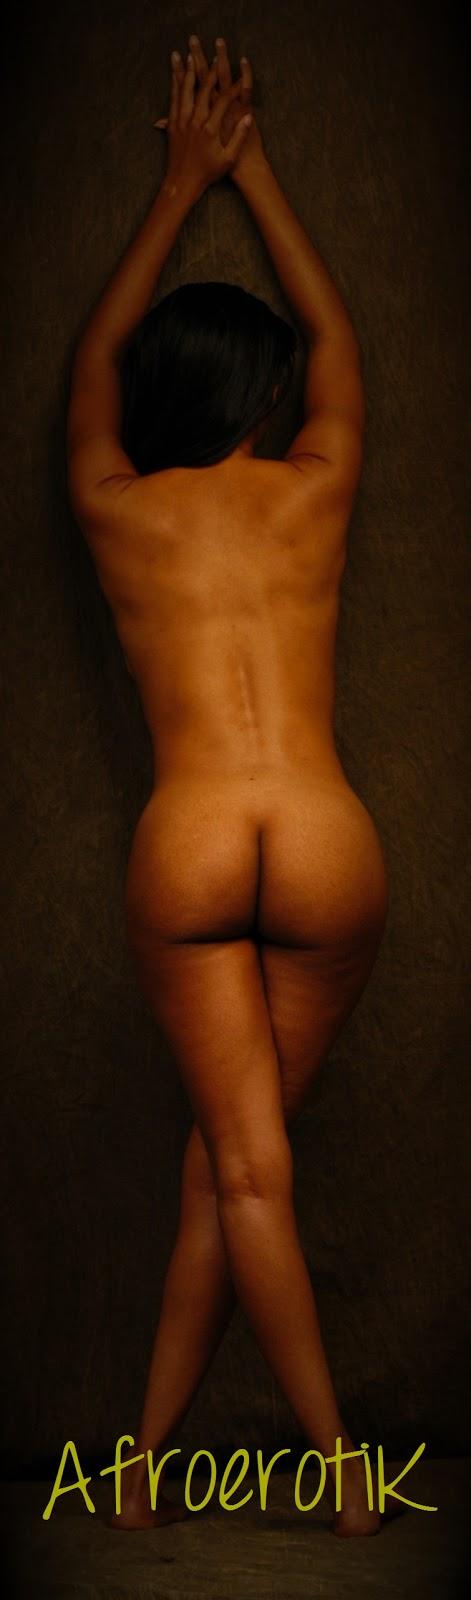 Certainly Black erotica afroerotik